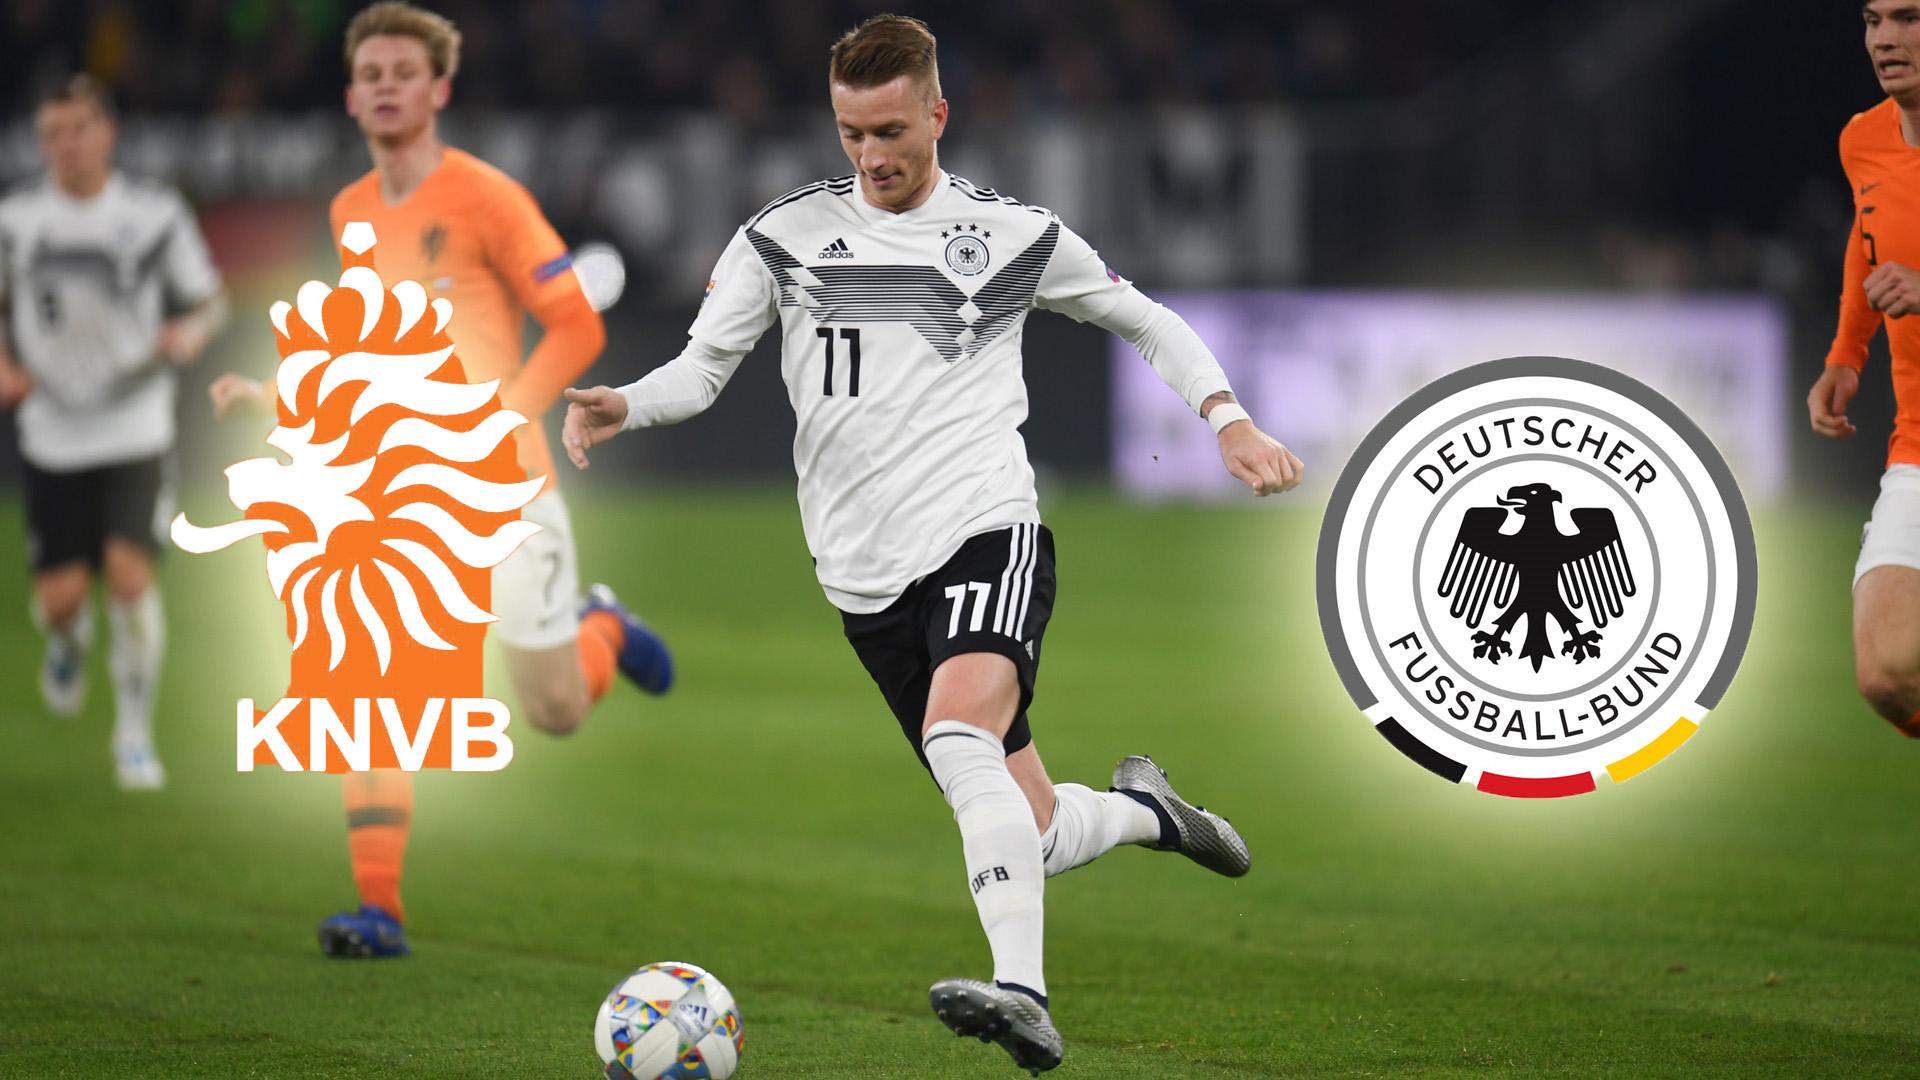 Wer Zeigt Ubertragt Niederlande Vs Deutschland Heute Live